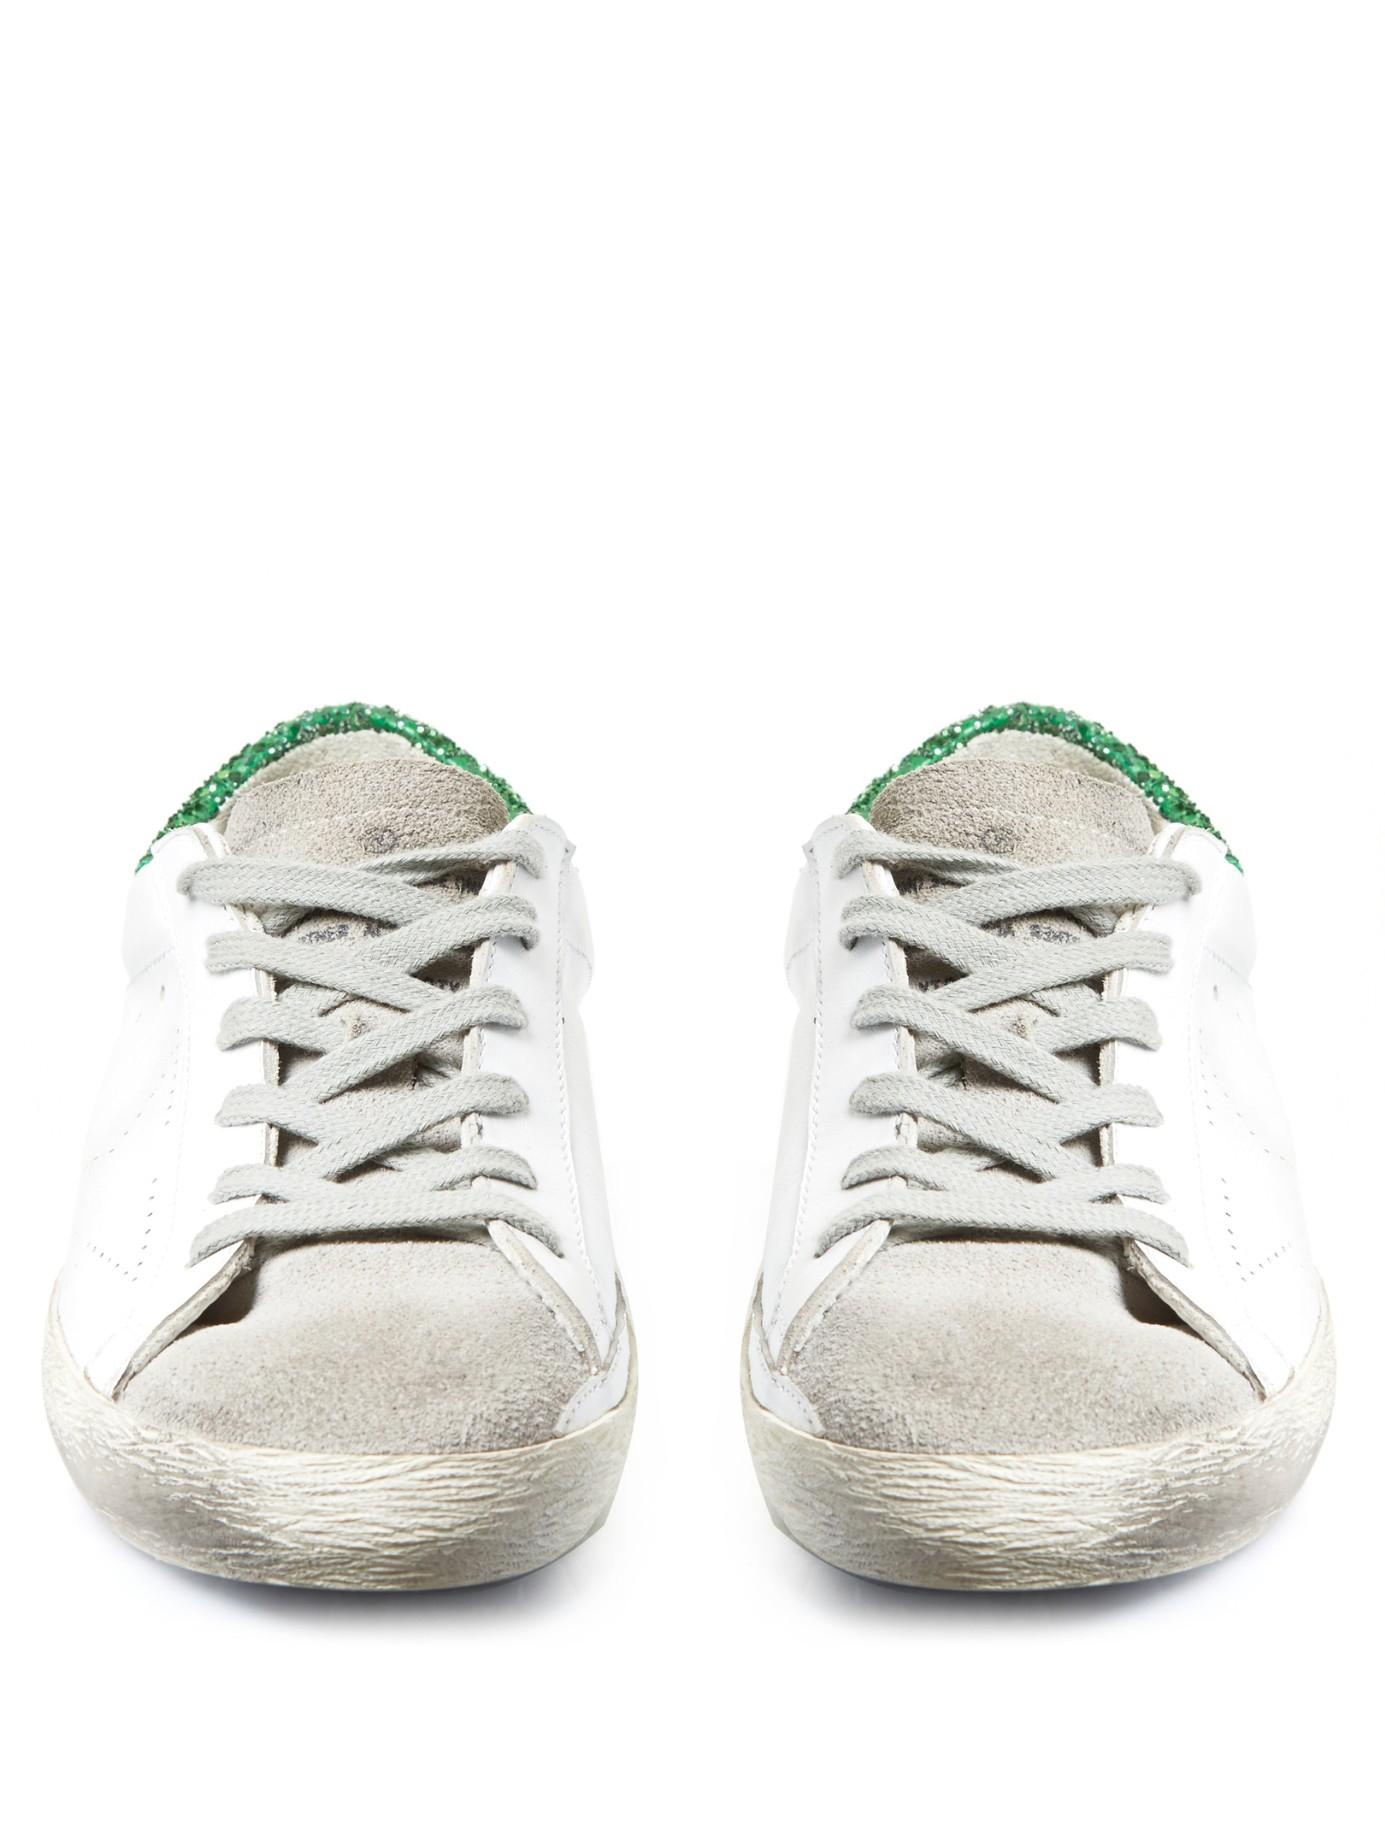 Superstar Glitter-Embellished Leather Sneakers Golden Goose DQUzI